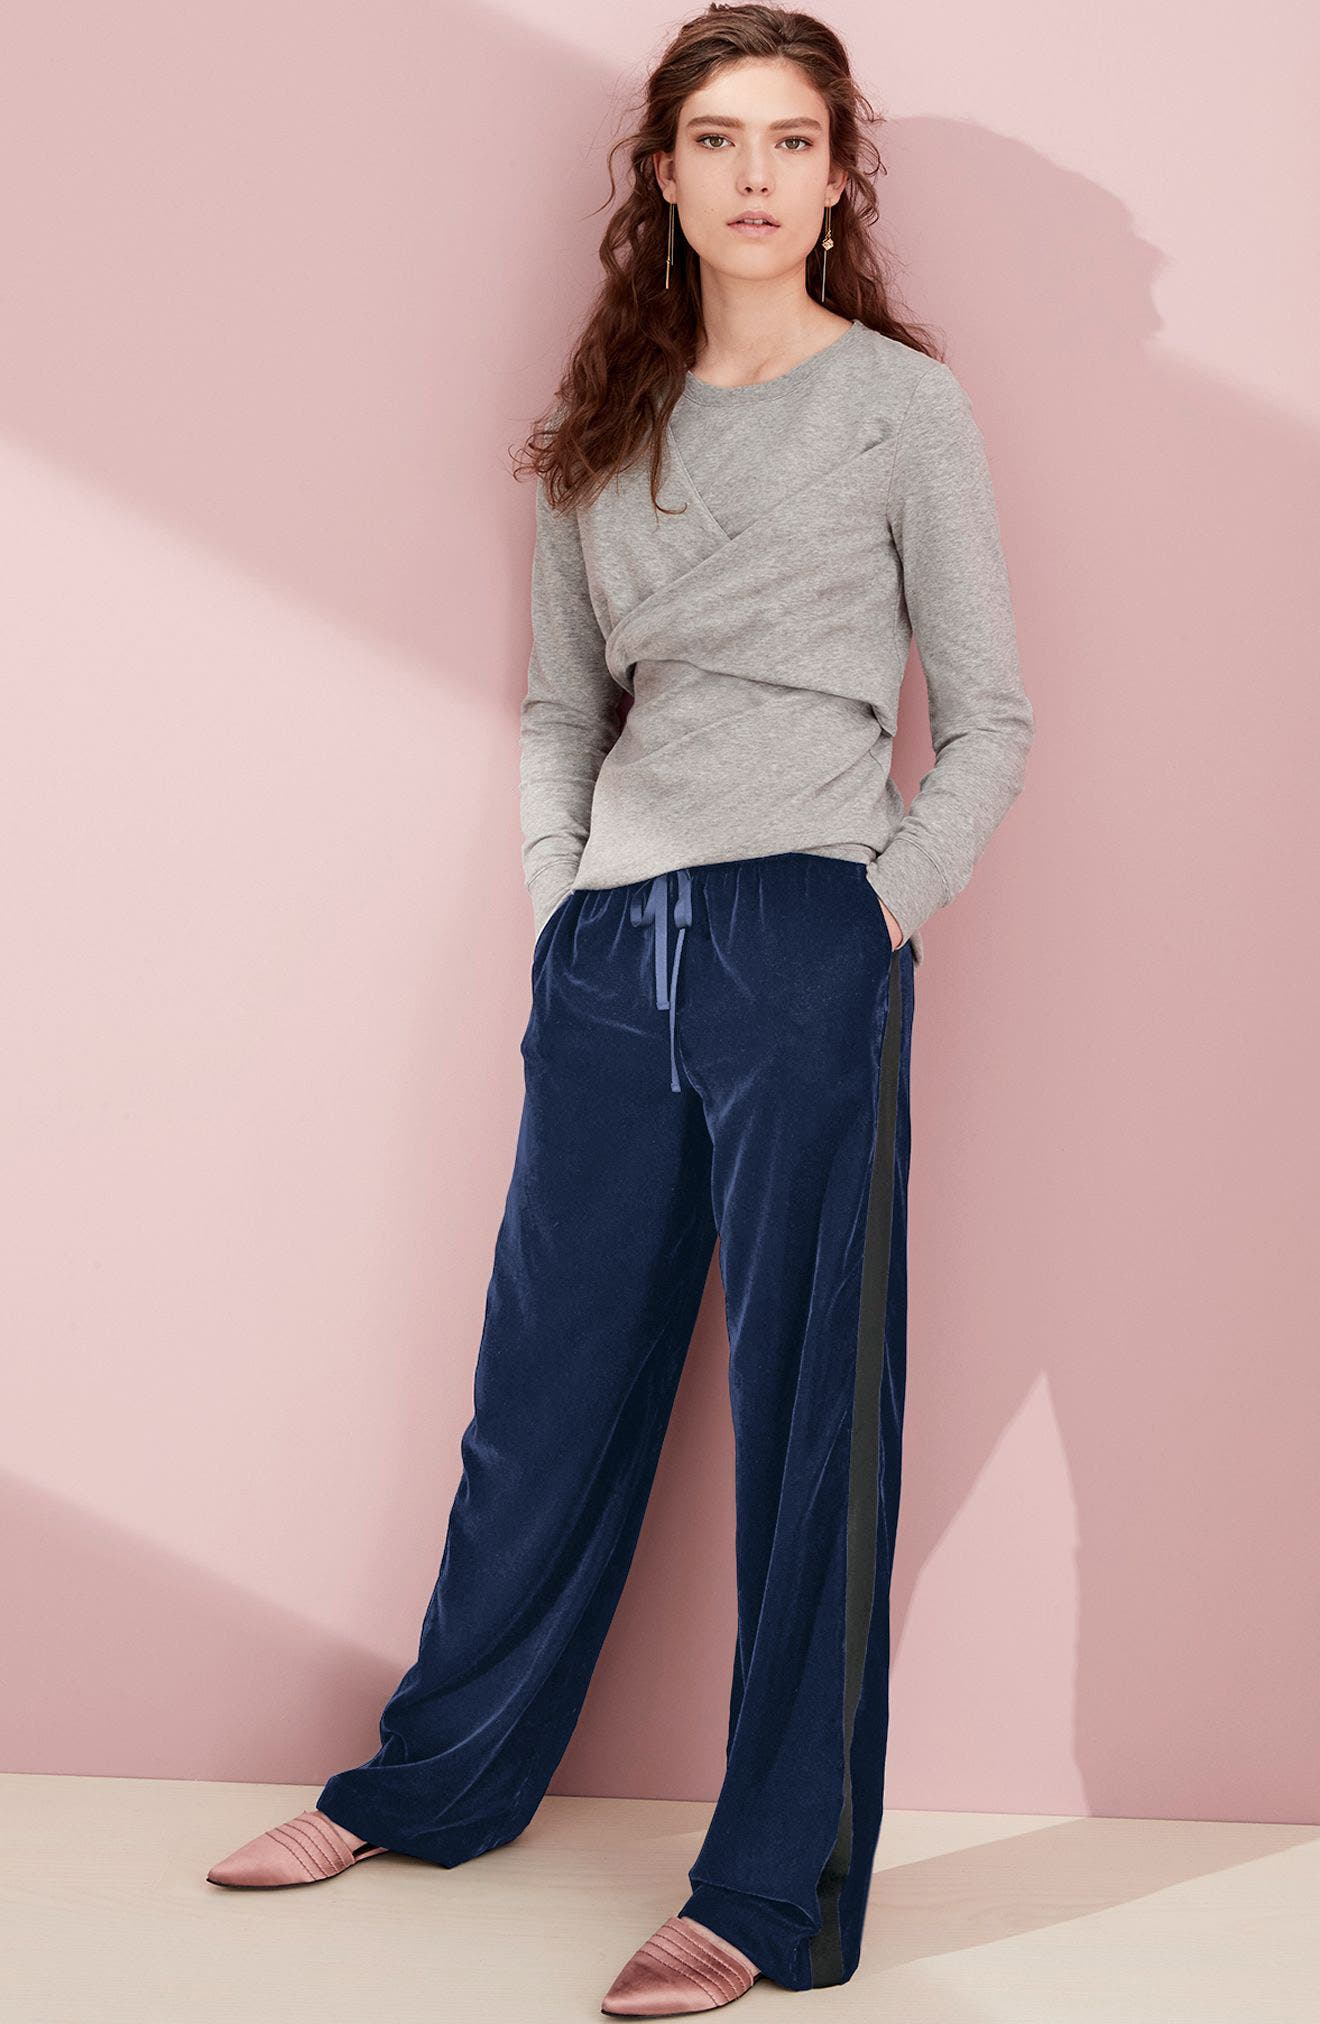 Trouvé Sweatshirt & Pants Outfit with Accessories